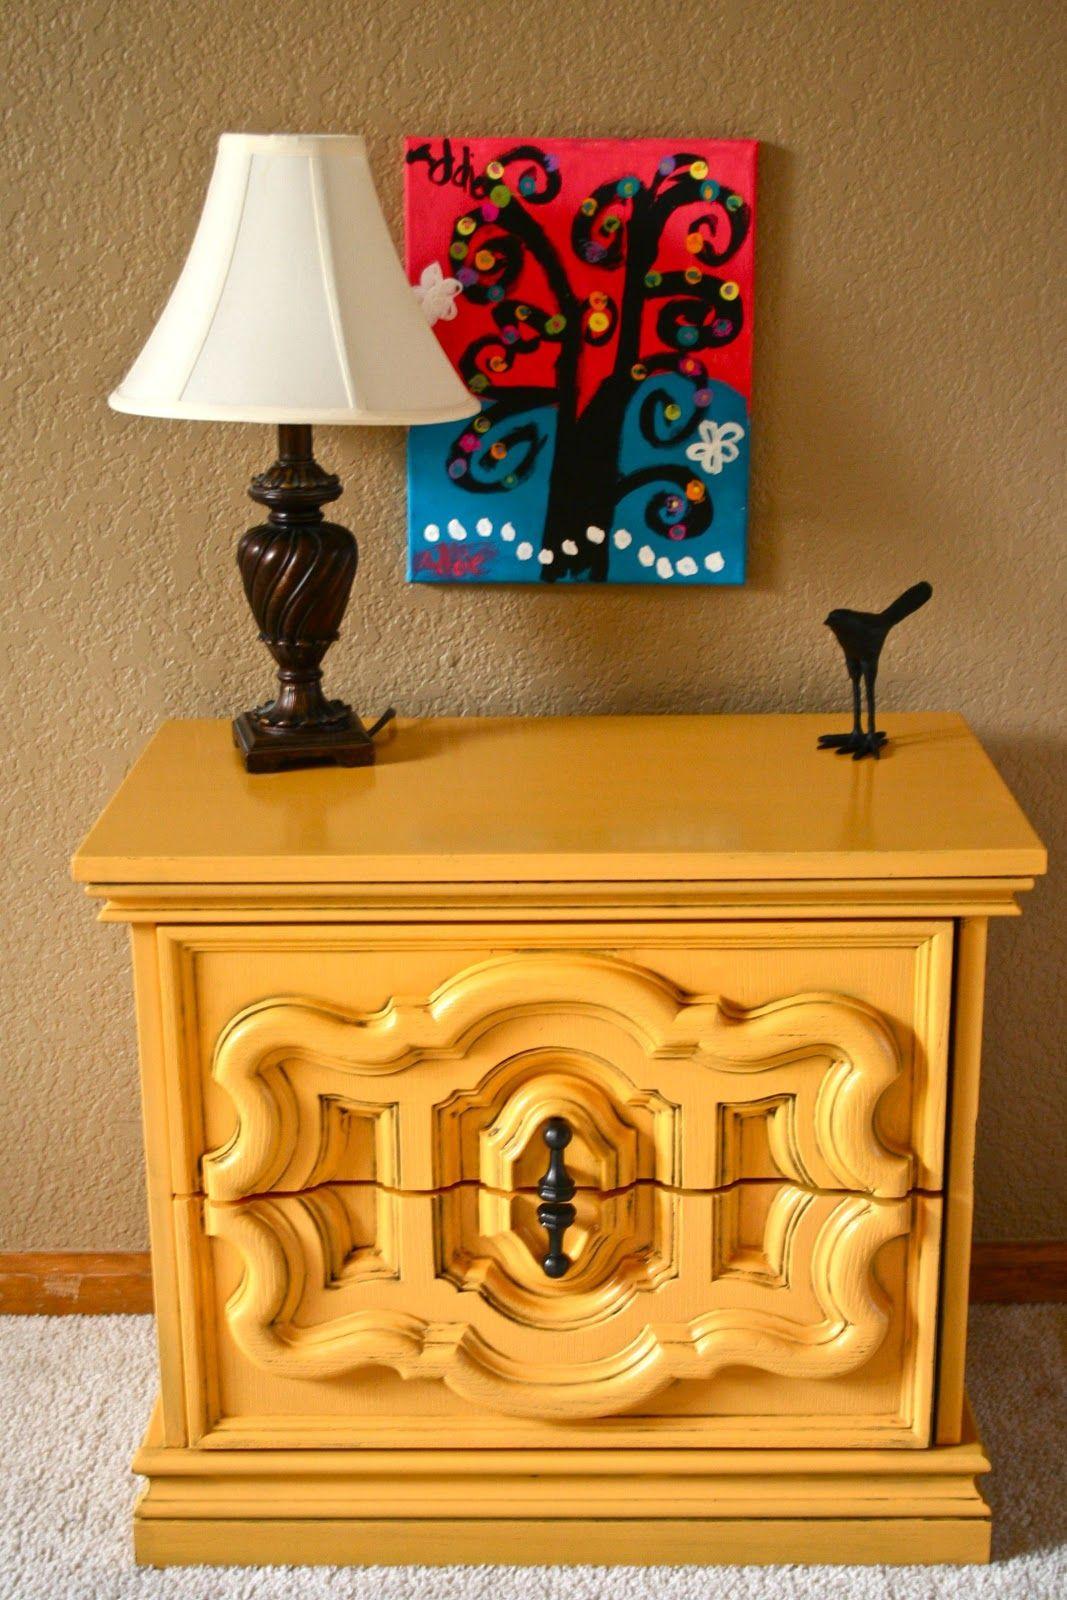 Krylon Bauhaus Gold retro nightstand with glaze Painted